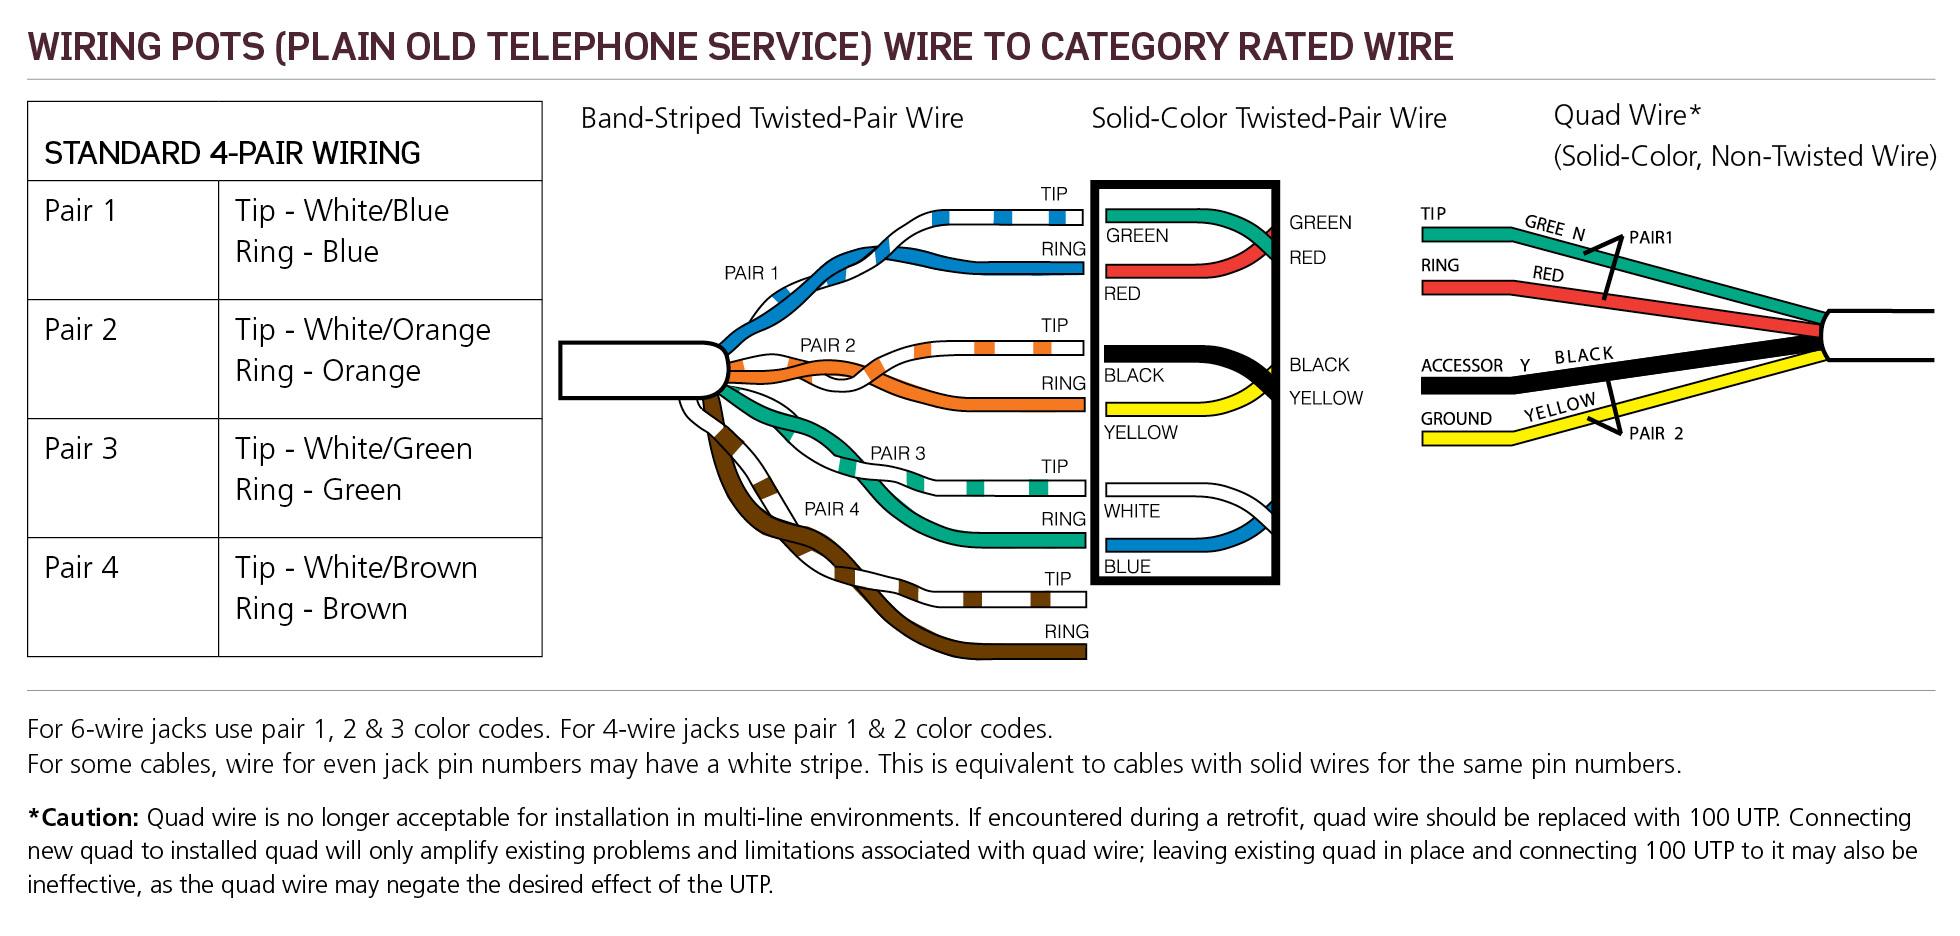 phone cord wires diagram schematic diagrams alarm wire diagram phone line wire diagram [ 1960 x 936 Pixel ]